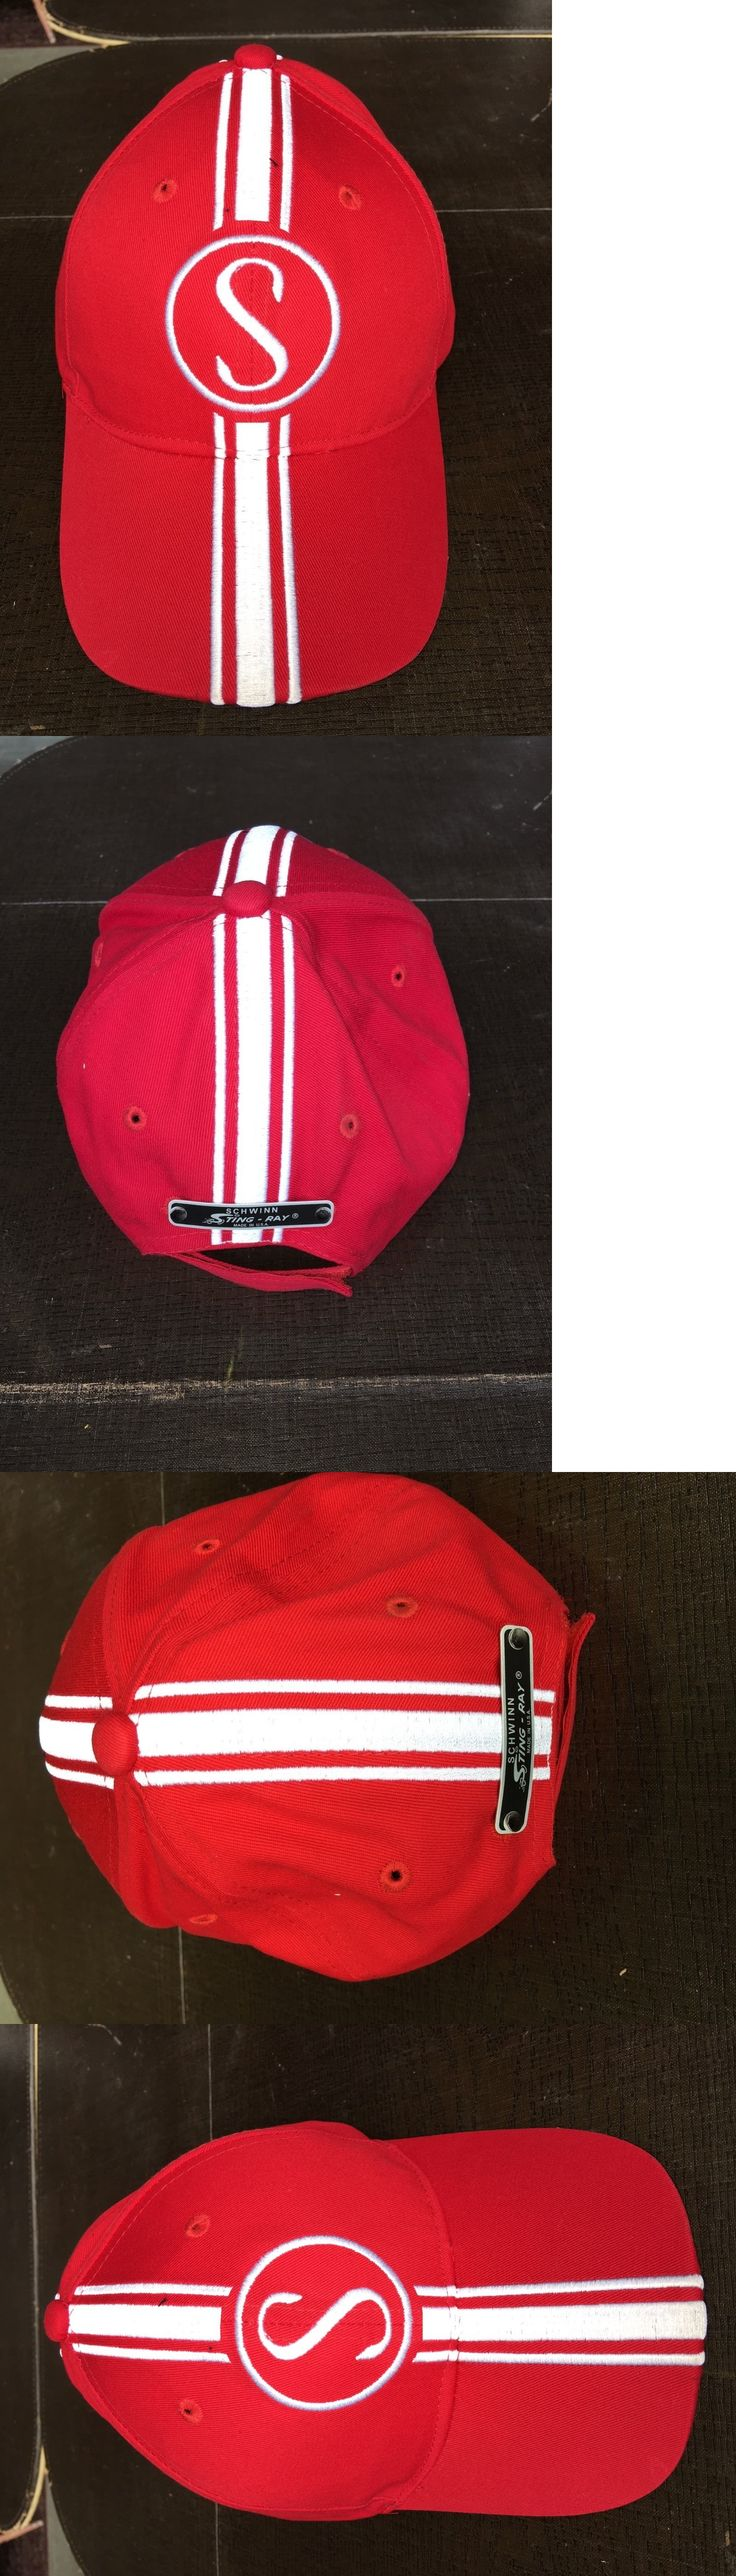 Hats Caps and Headbands 158994: Schwinn Apple Krate Stingray Hat Red W White Baseball Cap -> BUY IT NOW ONLY: $36.75 on eBay!